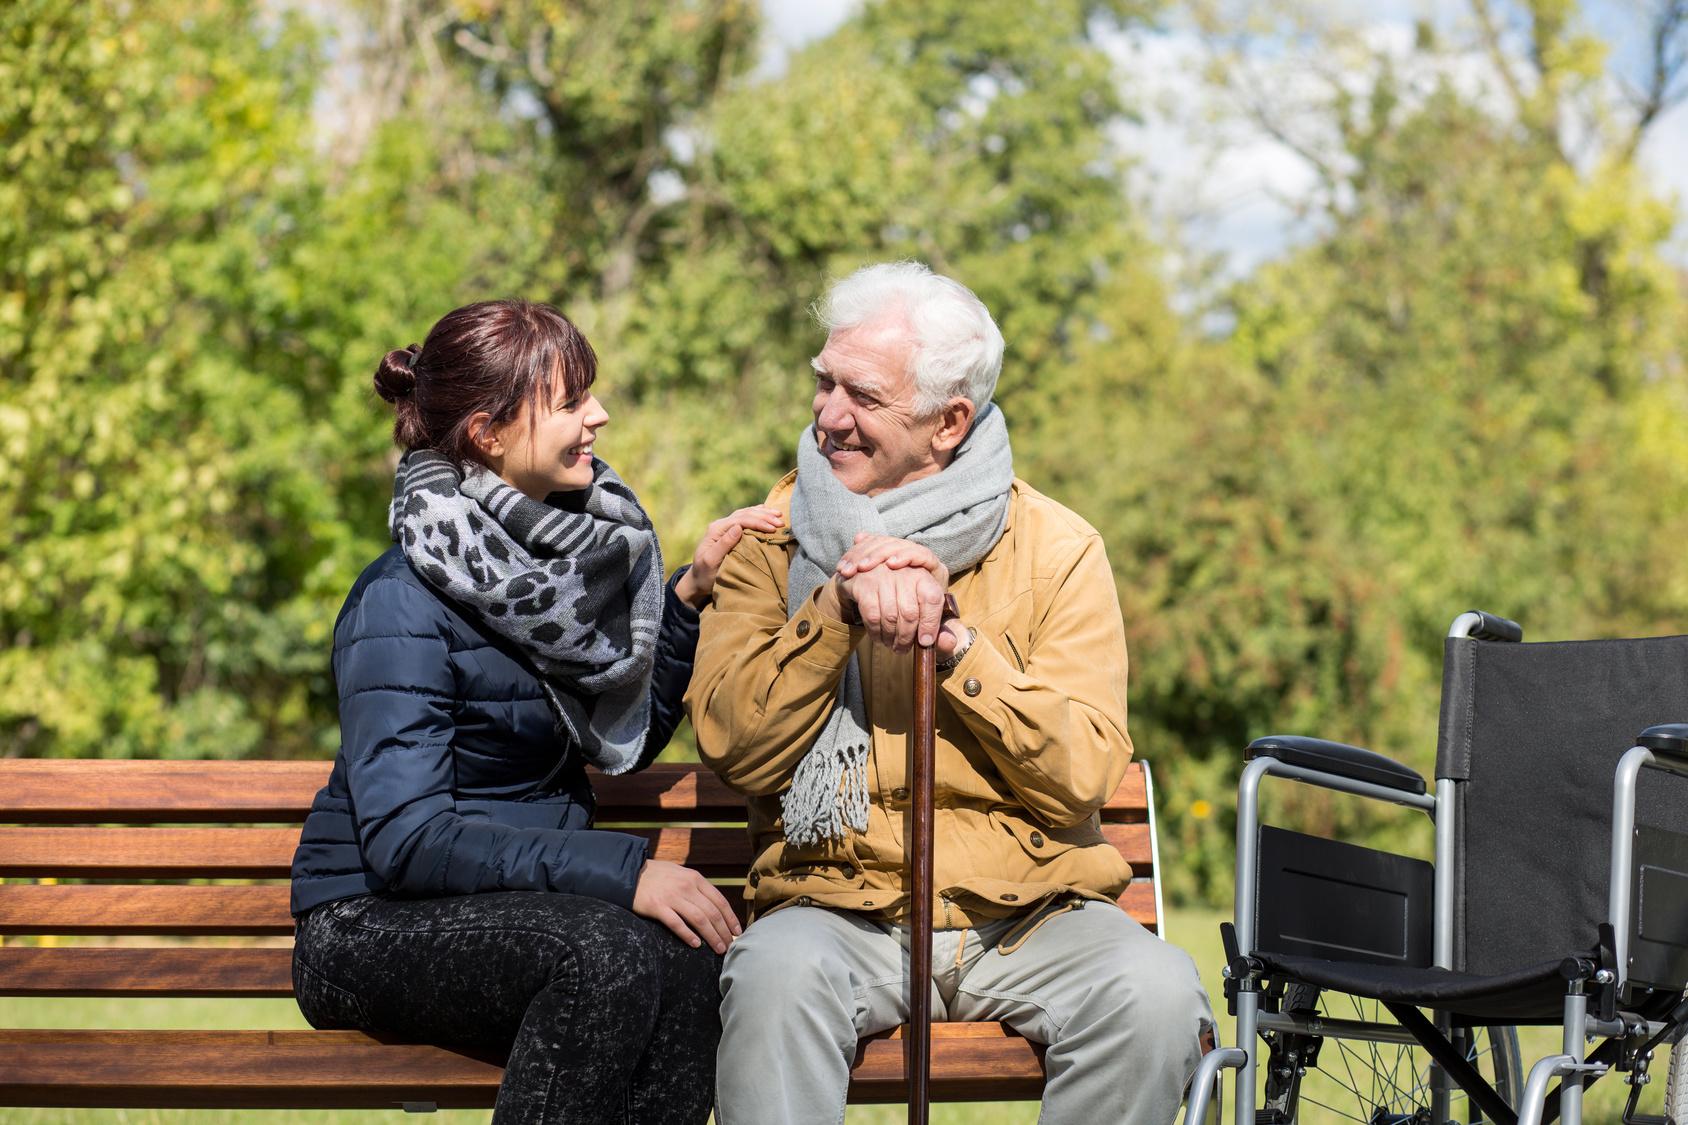 Elder man and carer in the park